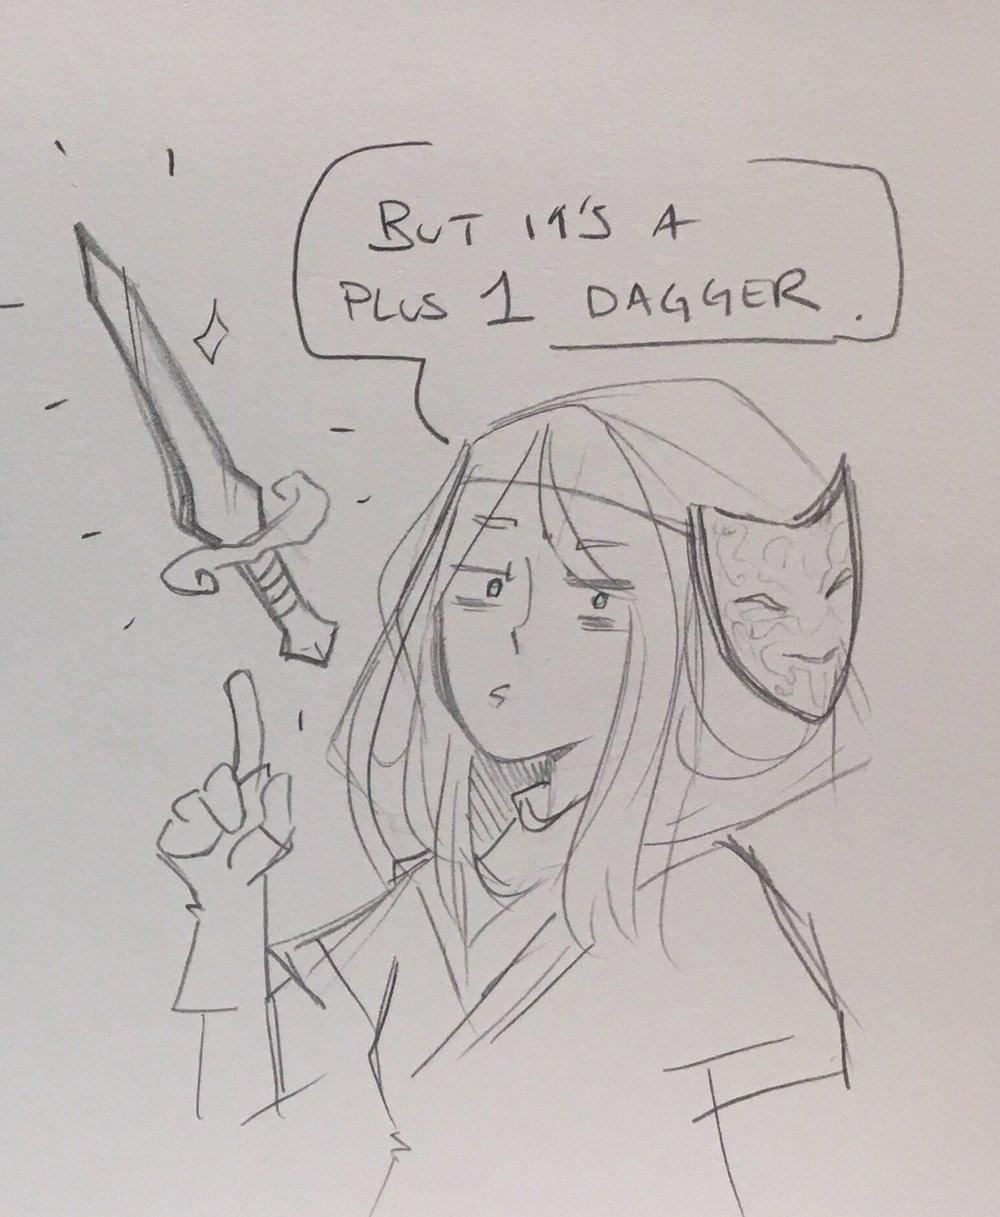 …But it's a plus 1 dagger   Art by the amazing  @ NatRoze  . Tumblr:  weirdsisterscomic.tumblr.com